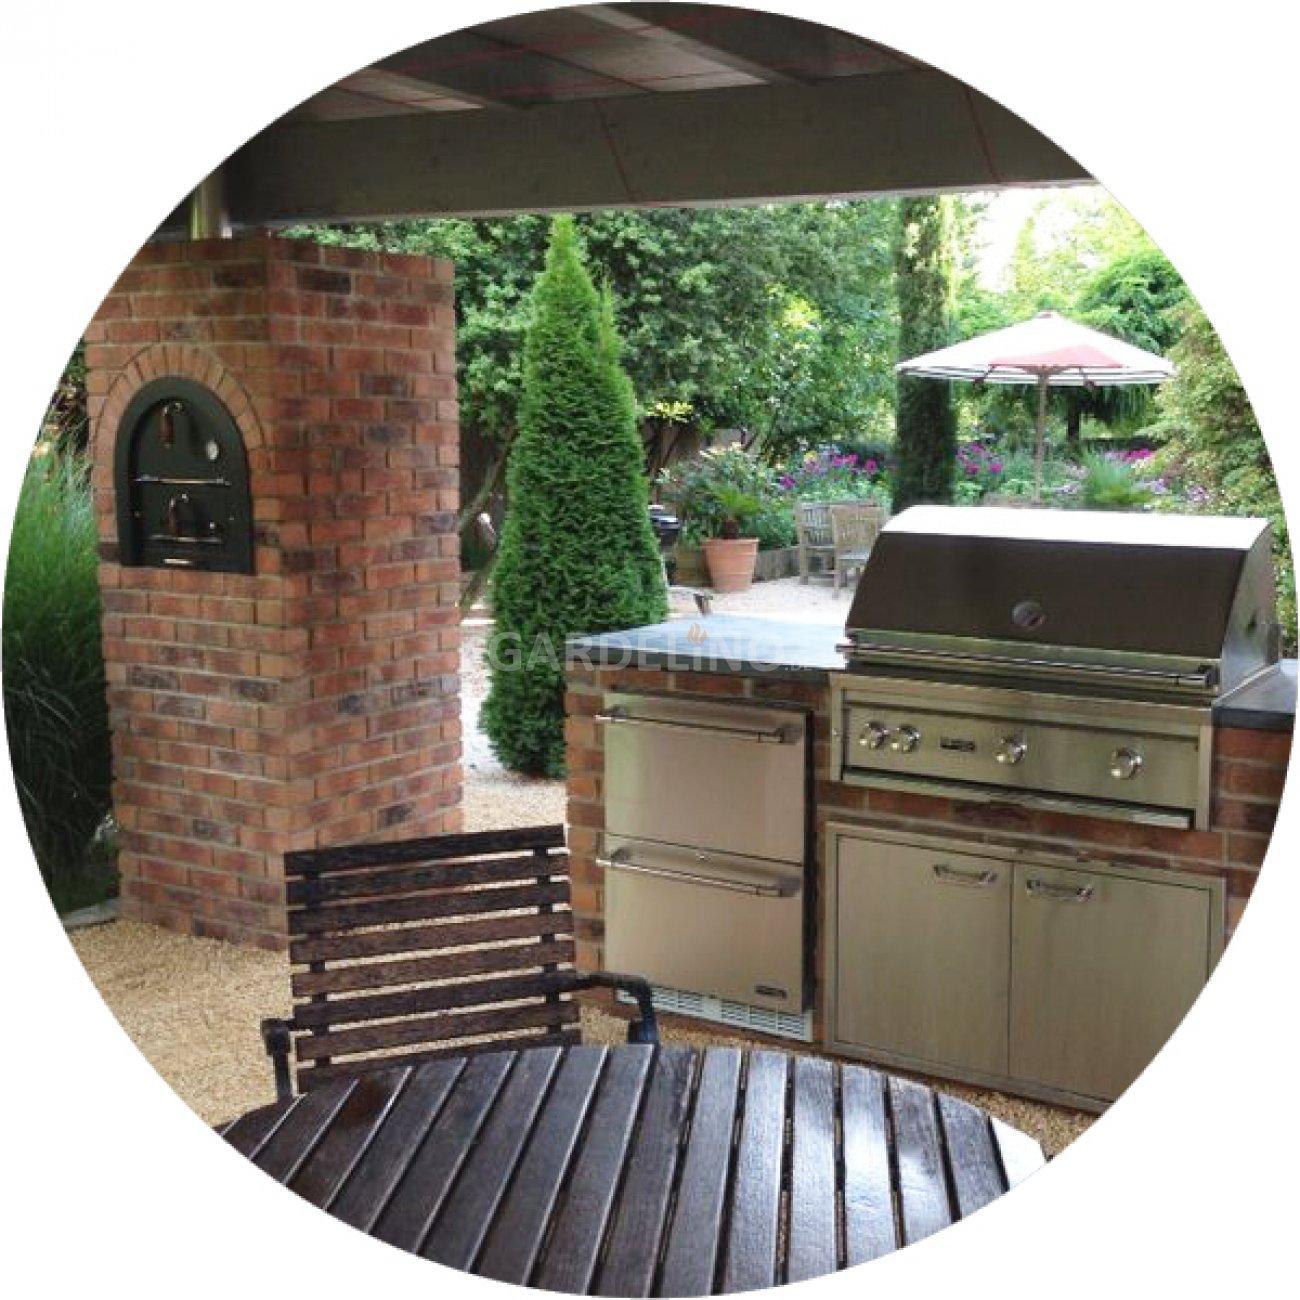 Lynx Outdoor-Küche I Partnerbericht auf Gardelino.de